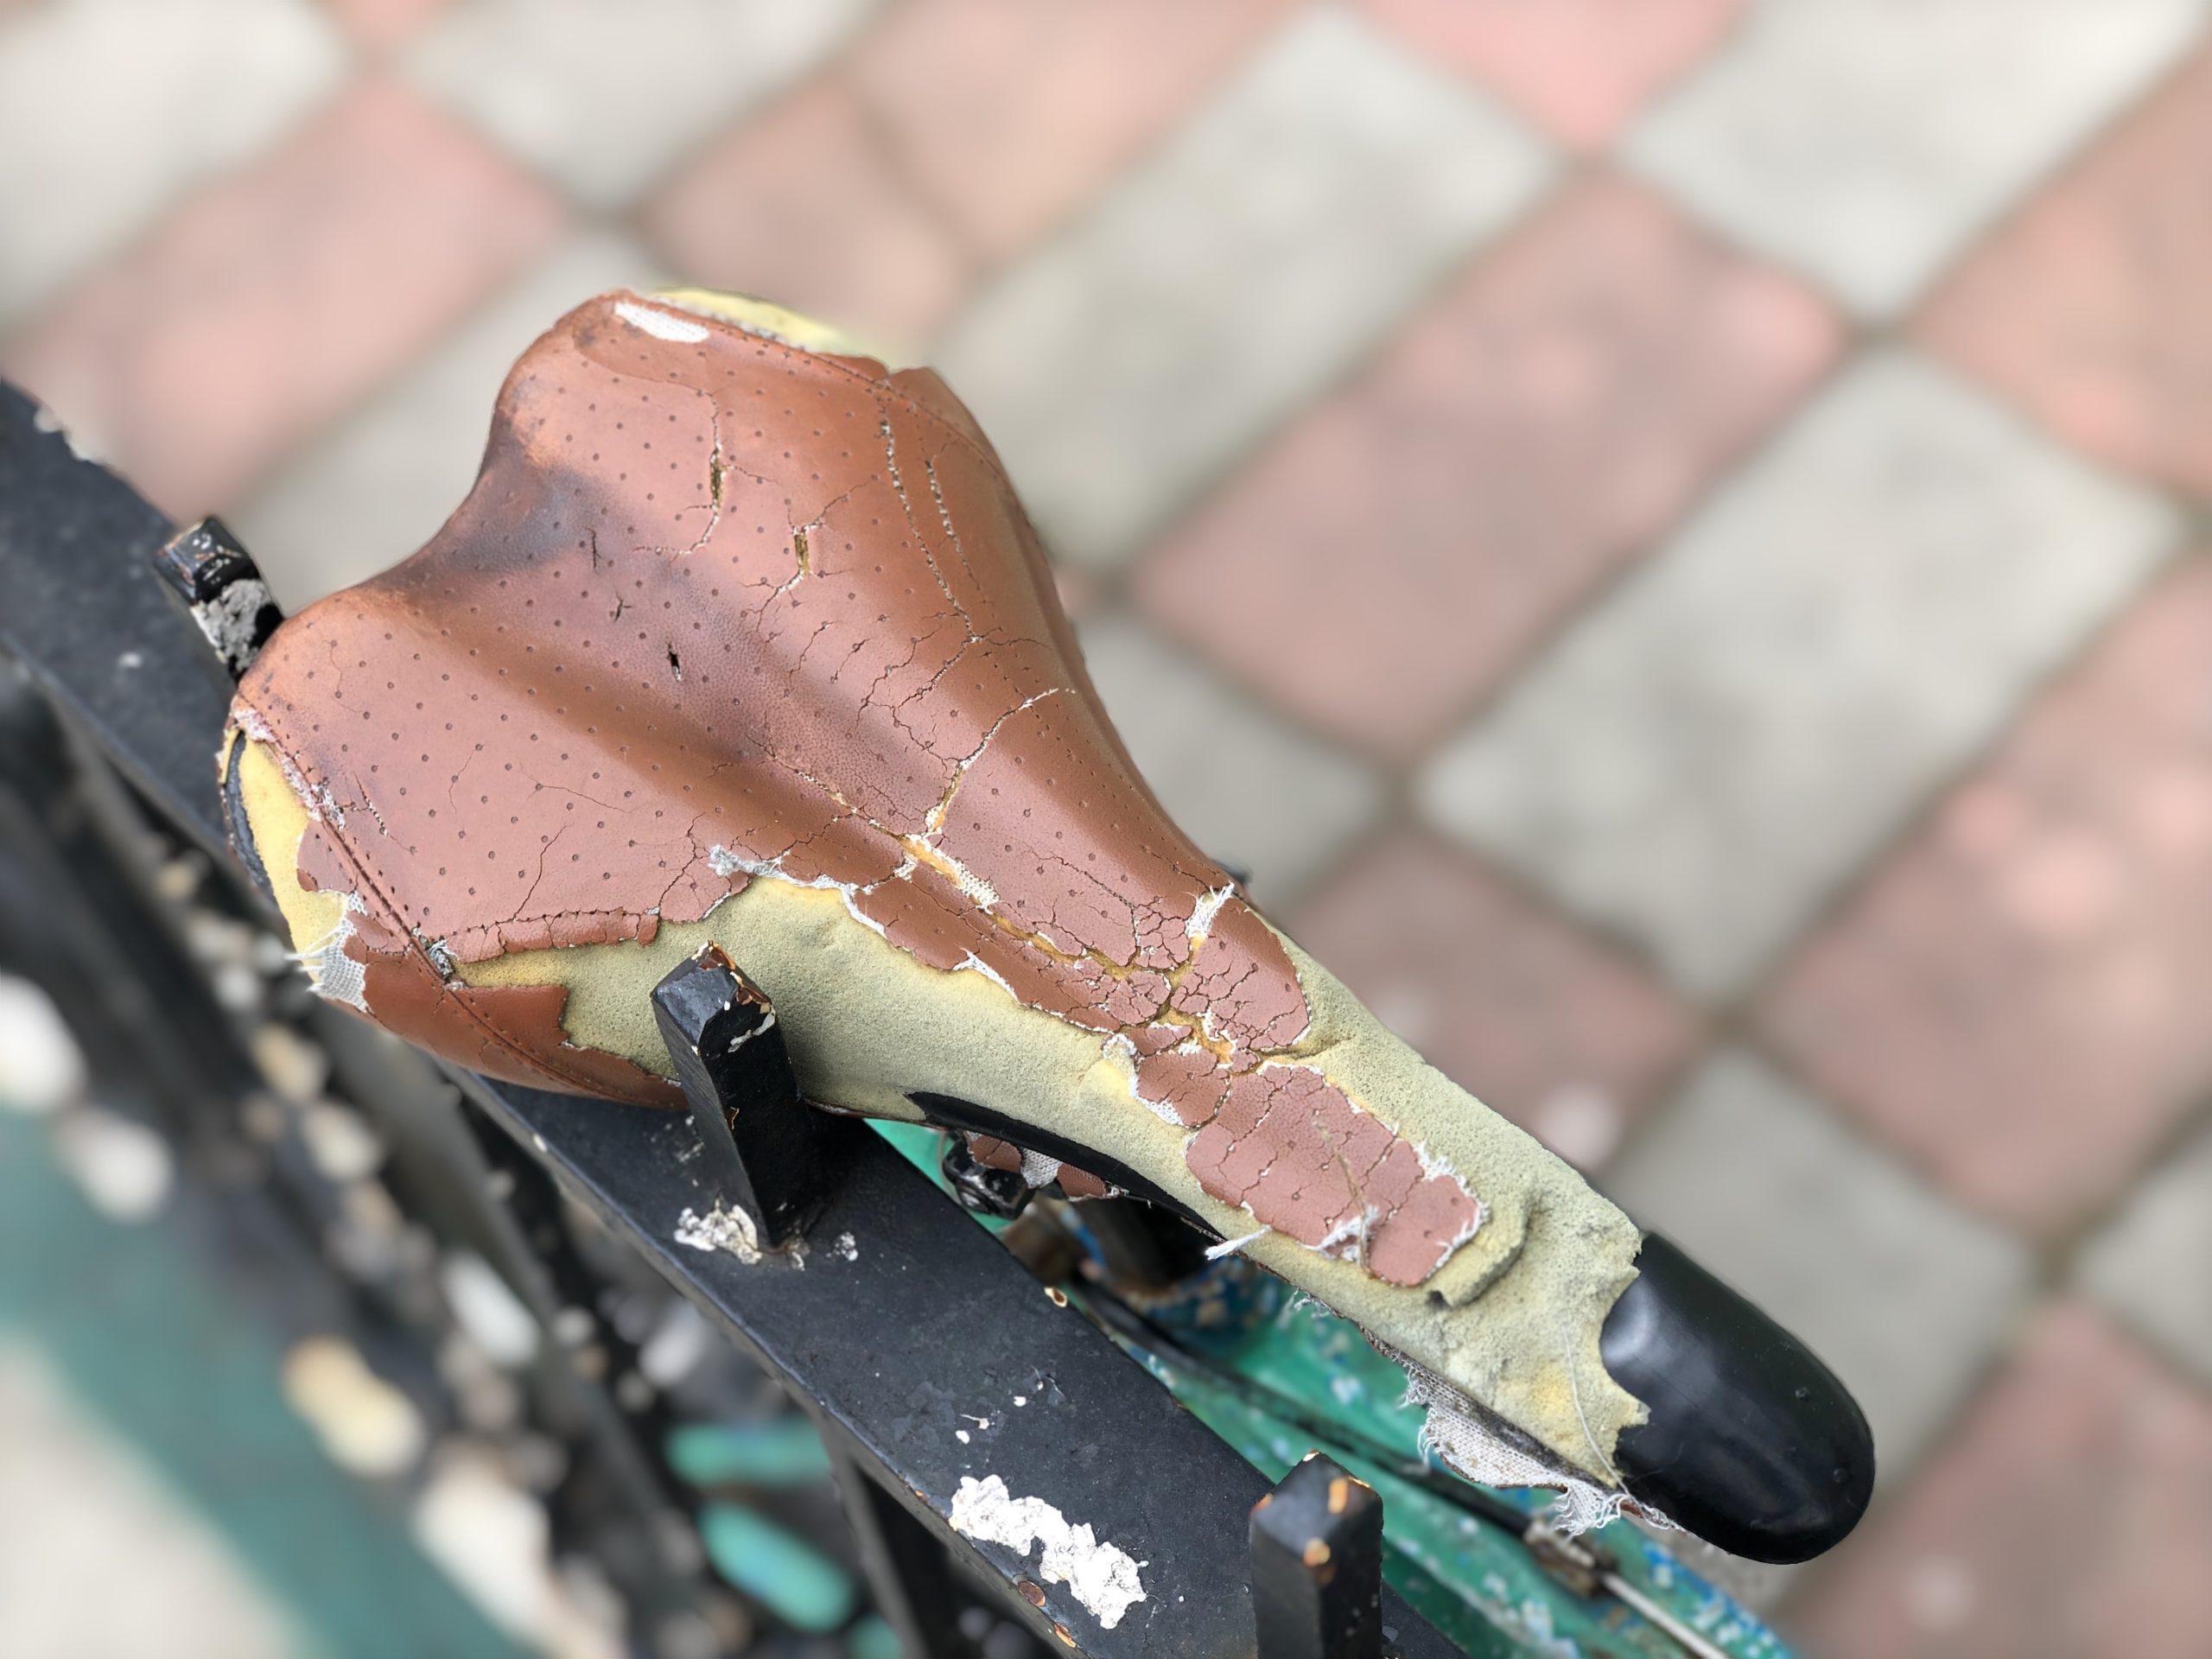 sillin de bicicleta desgastado